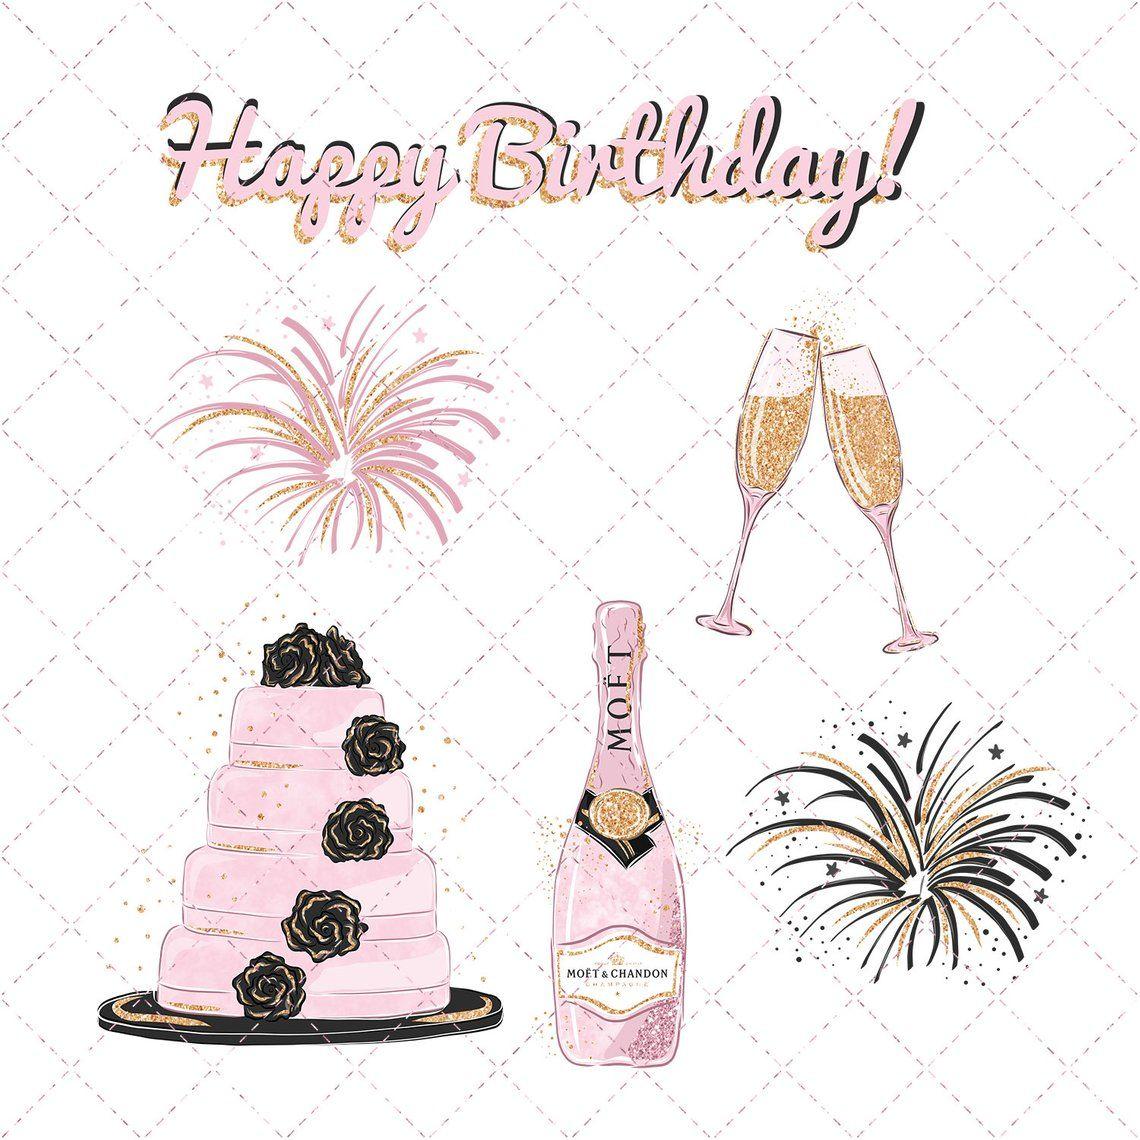 Birthday Watercolor Clipart Party Clipart Happy Birthday Hand Painted Birthday Girl Gift Balloons Birthday Cake Champagne Pink Floral Ballonnen Illustraties Verjaardag Ballonnen